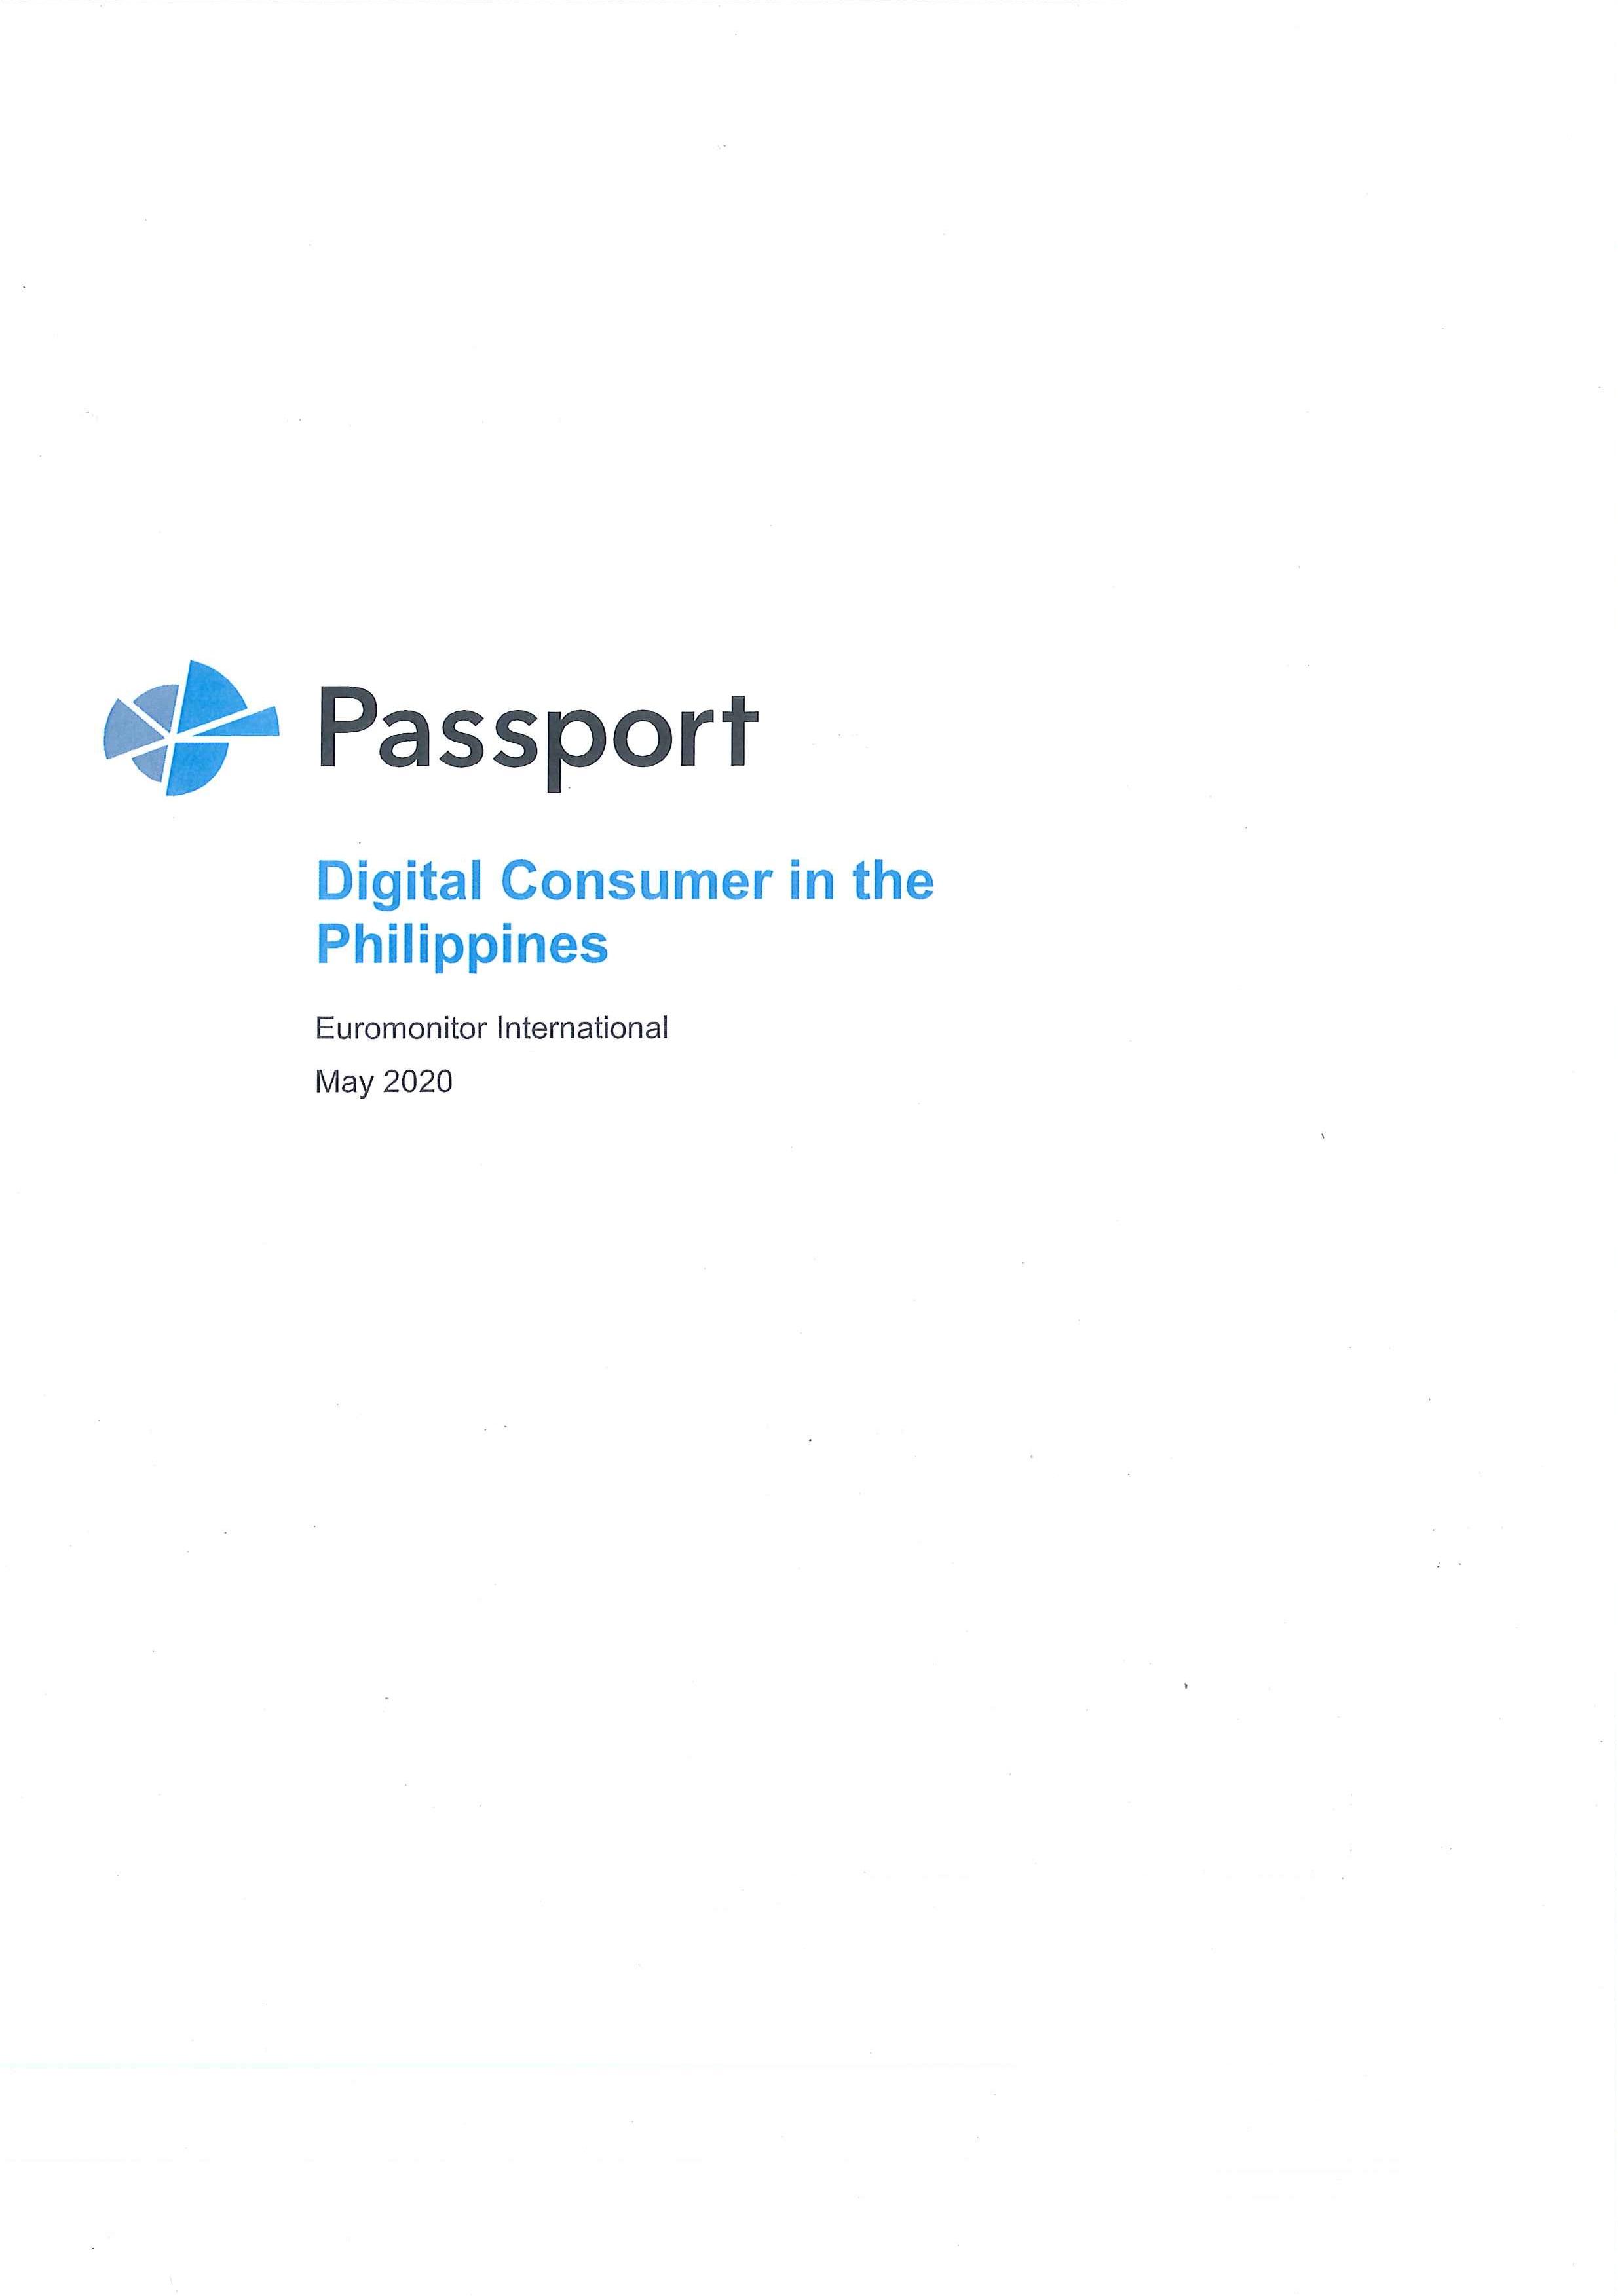 Digital consumer in the Philippines [e-book]